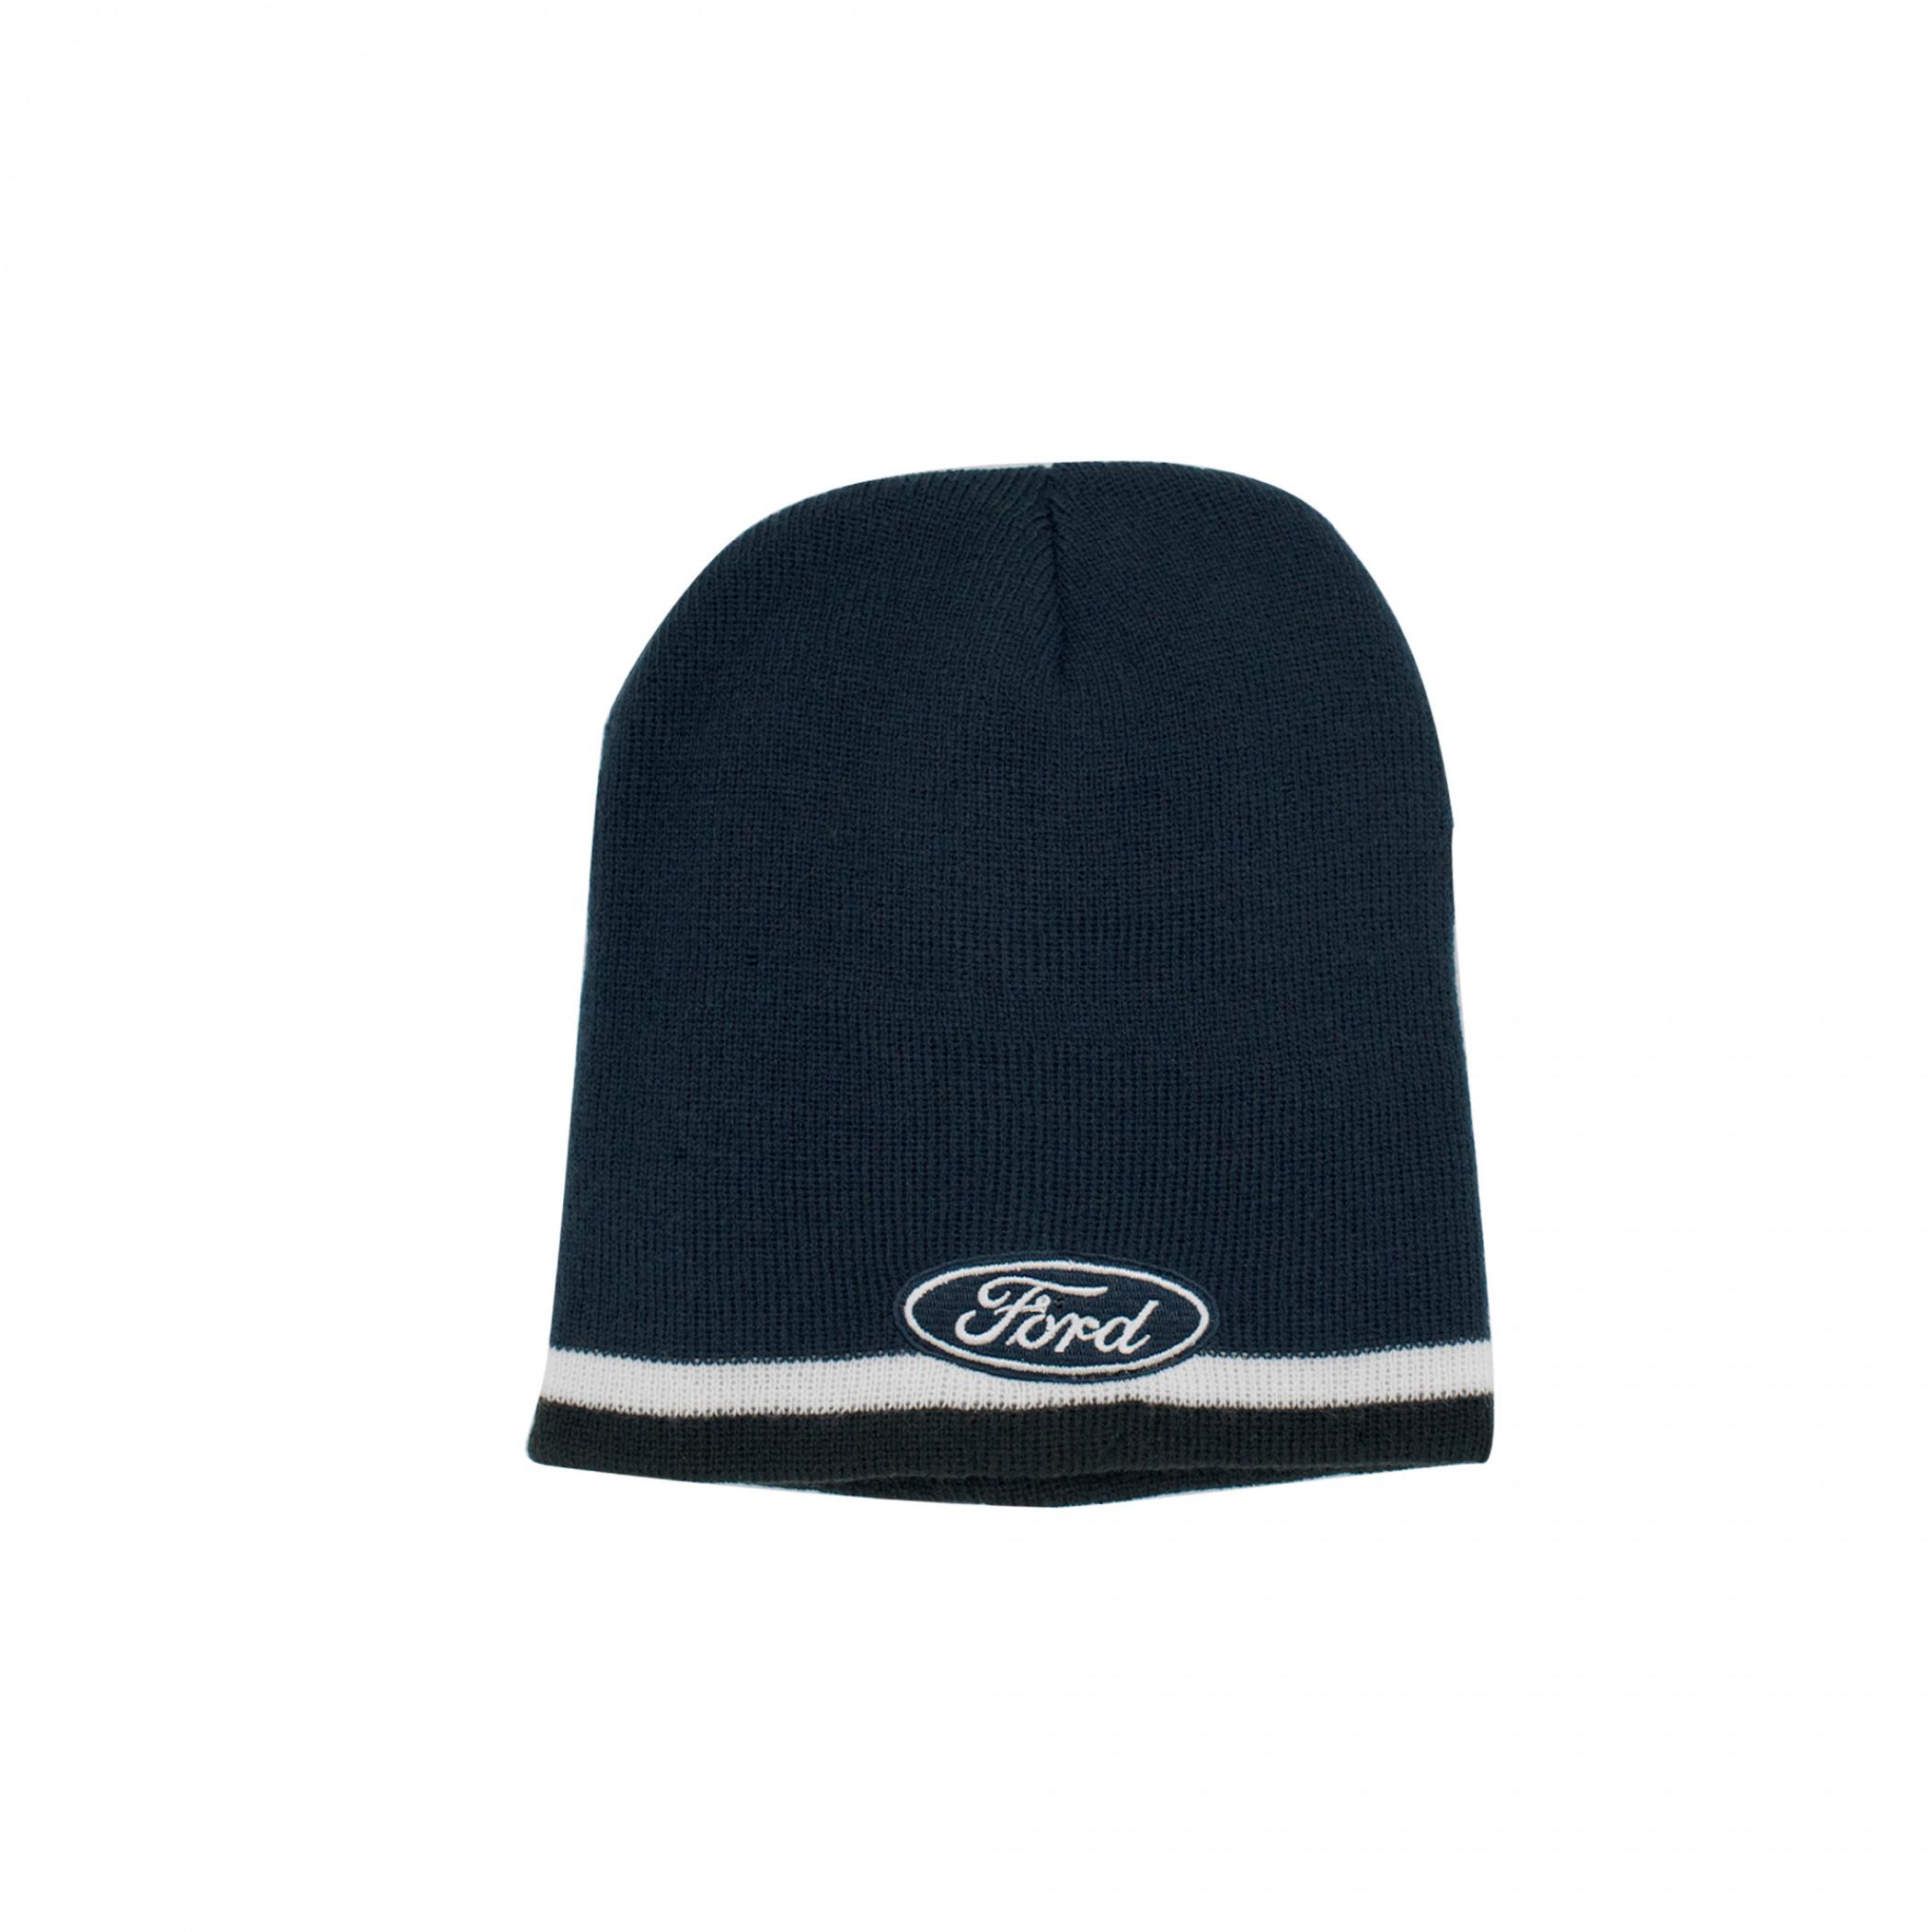 Ford Oval Logo Striped Knit Beanie